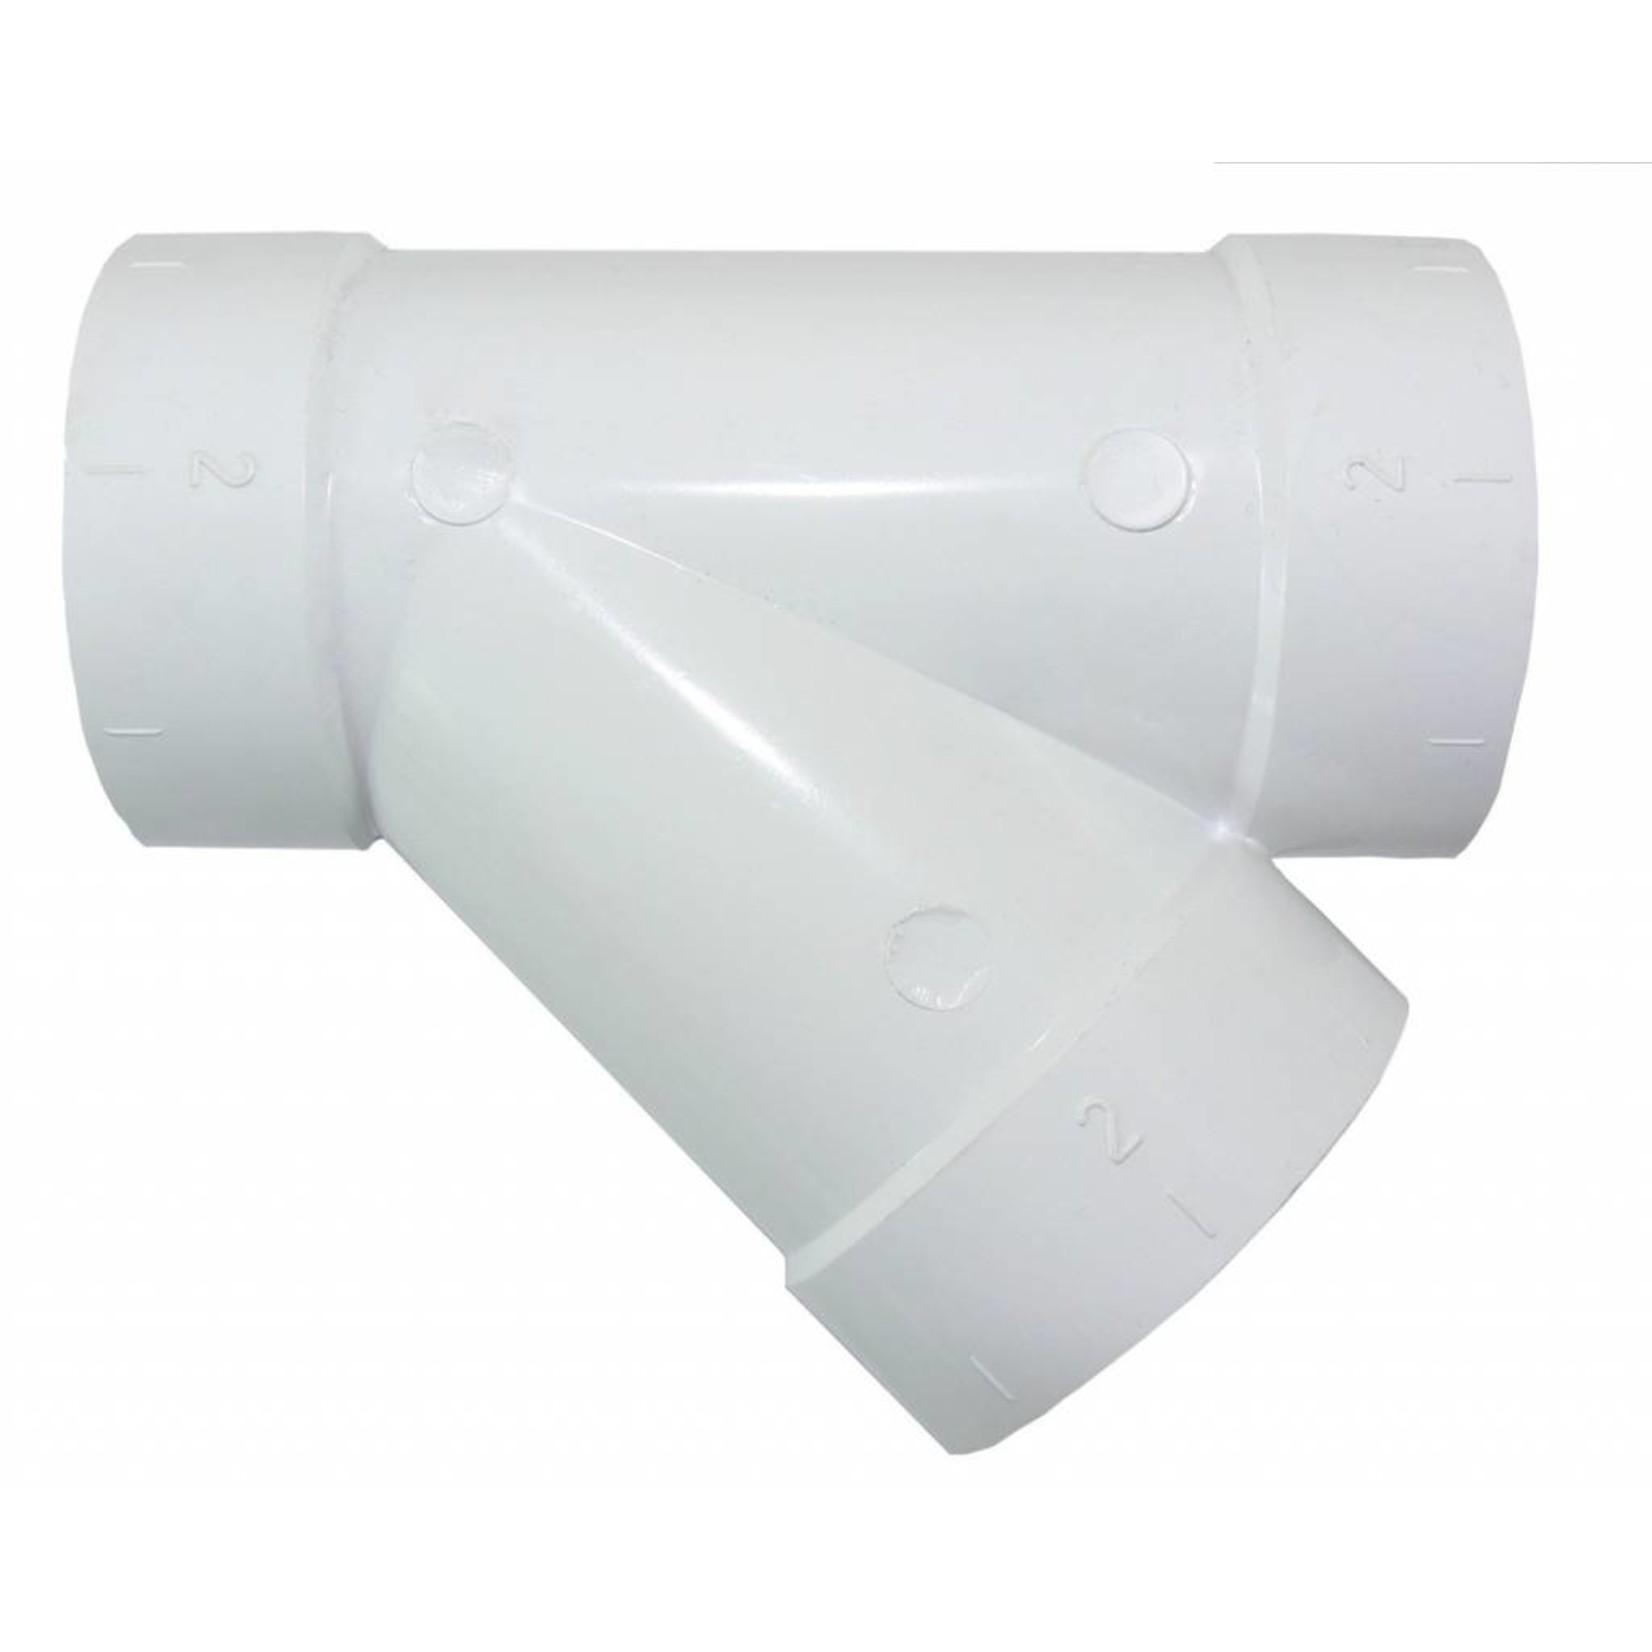 Plastiflex CVS 45 Y Branch Fitting - Single